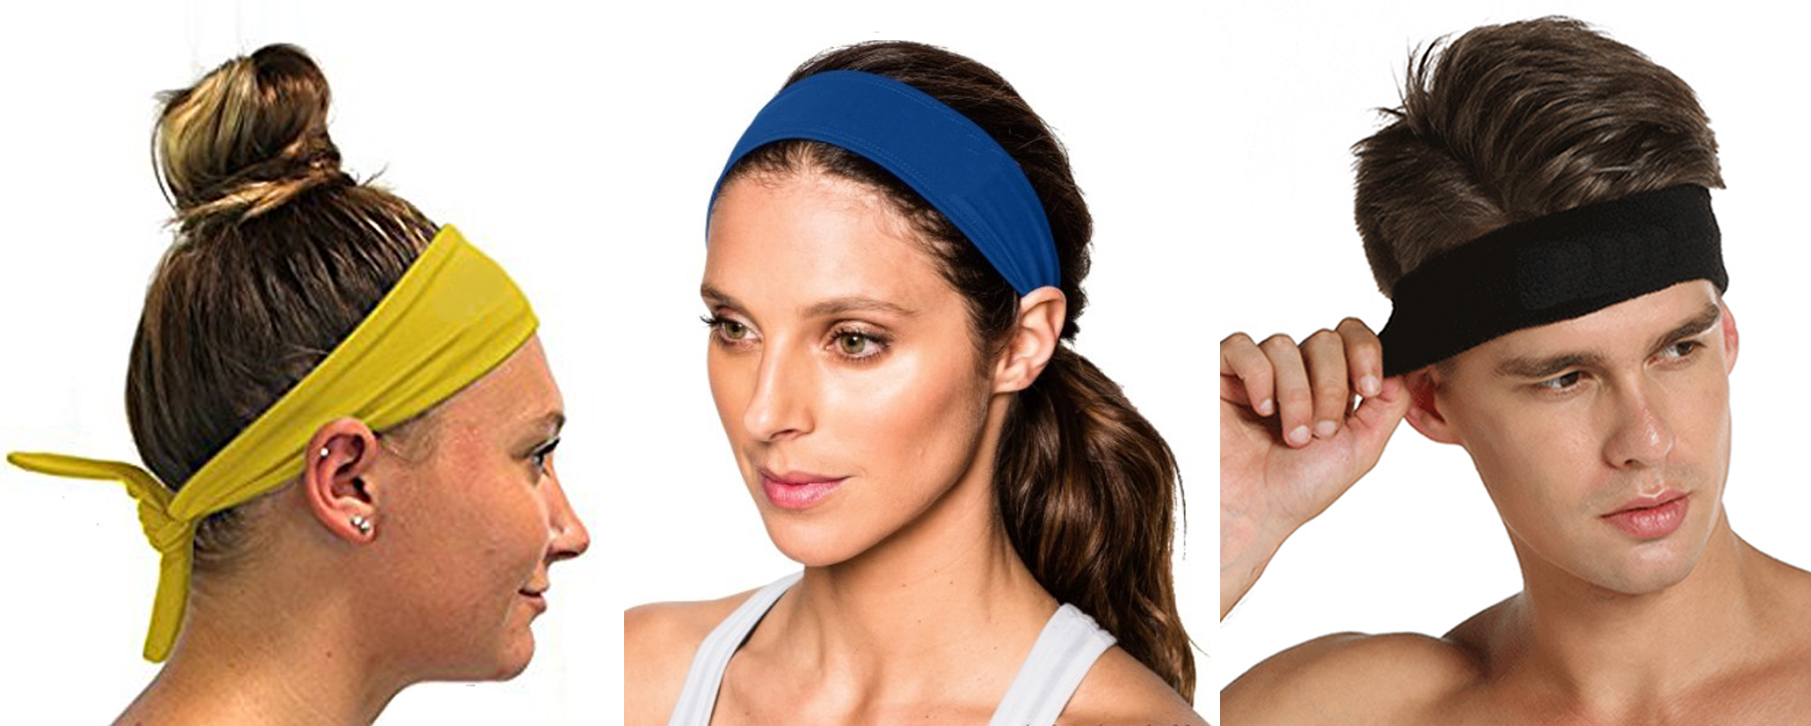 Sport Headbands - Adjustable tie back with no-slip grip strip